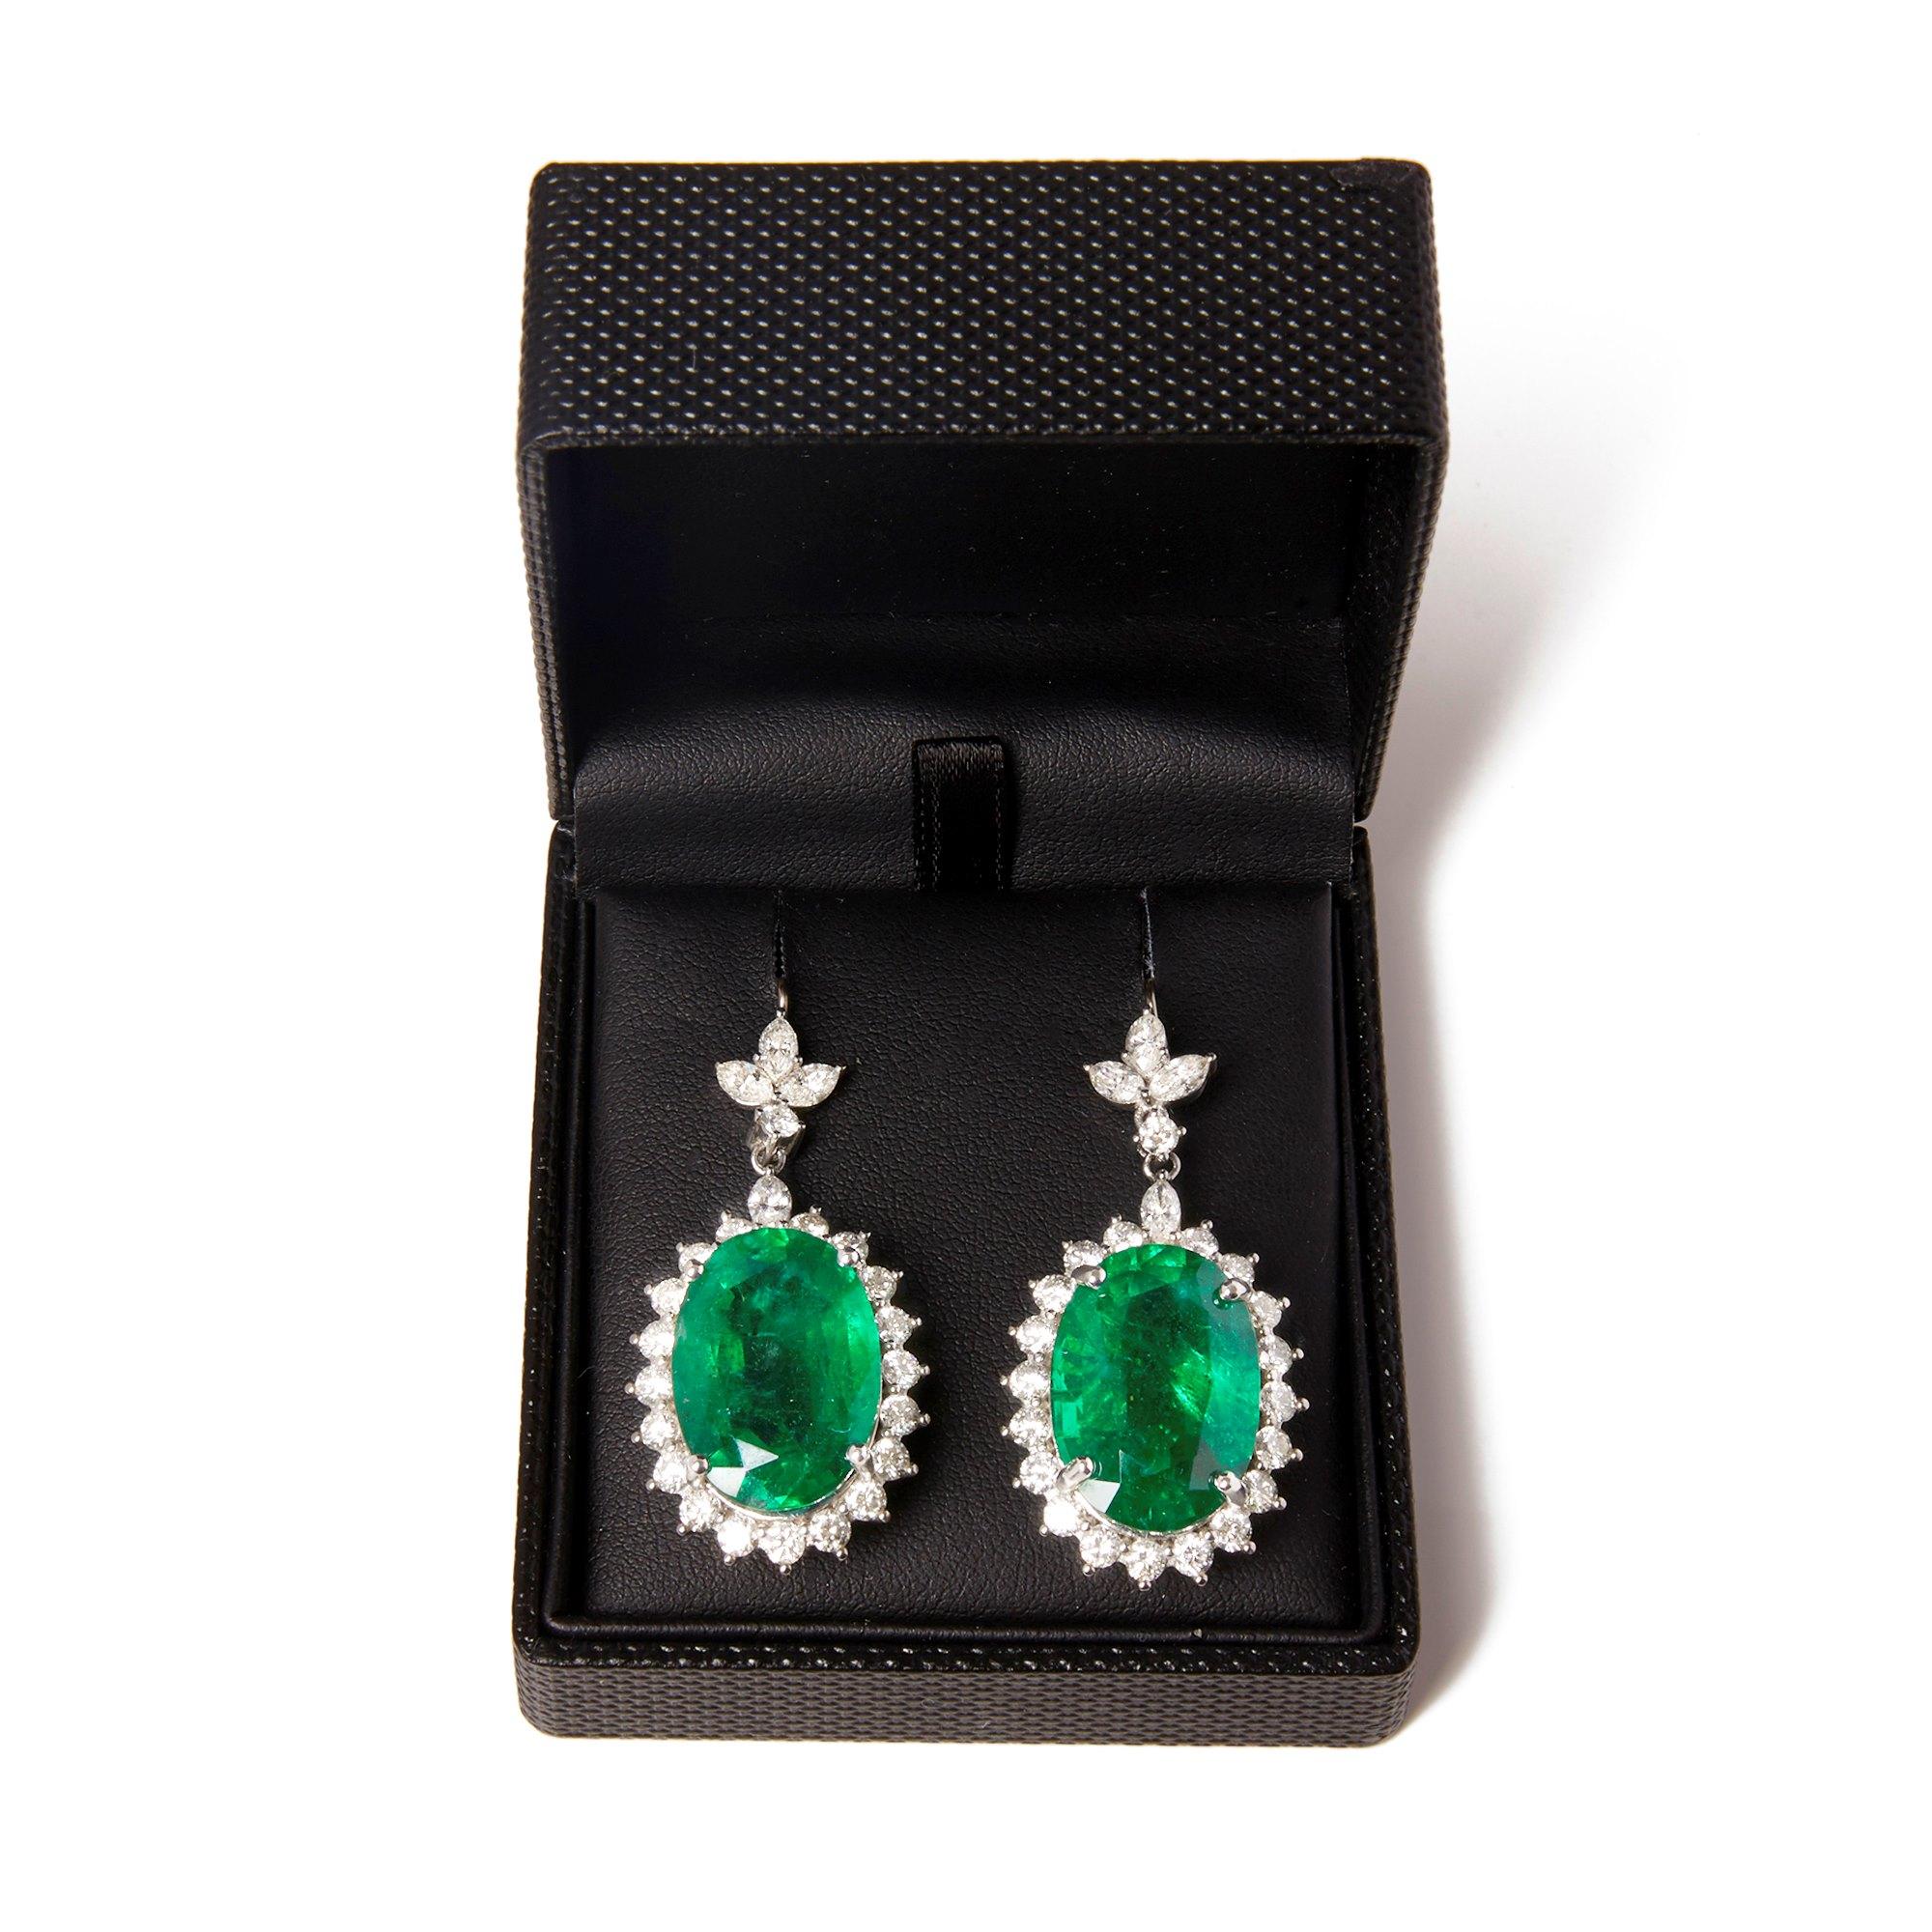 David Jerome 18k White Gold Emerald and Diamond Drop Earrings